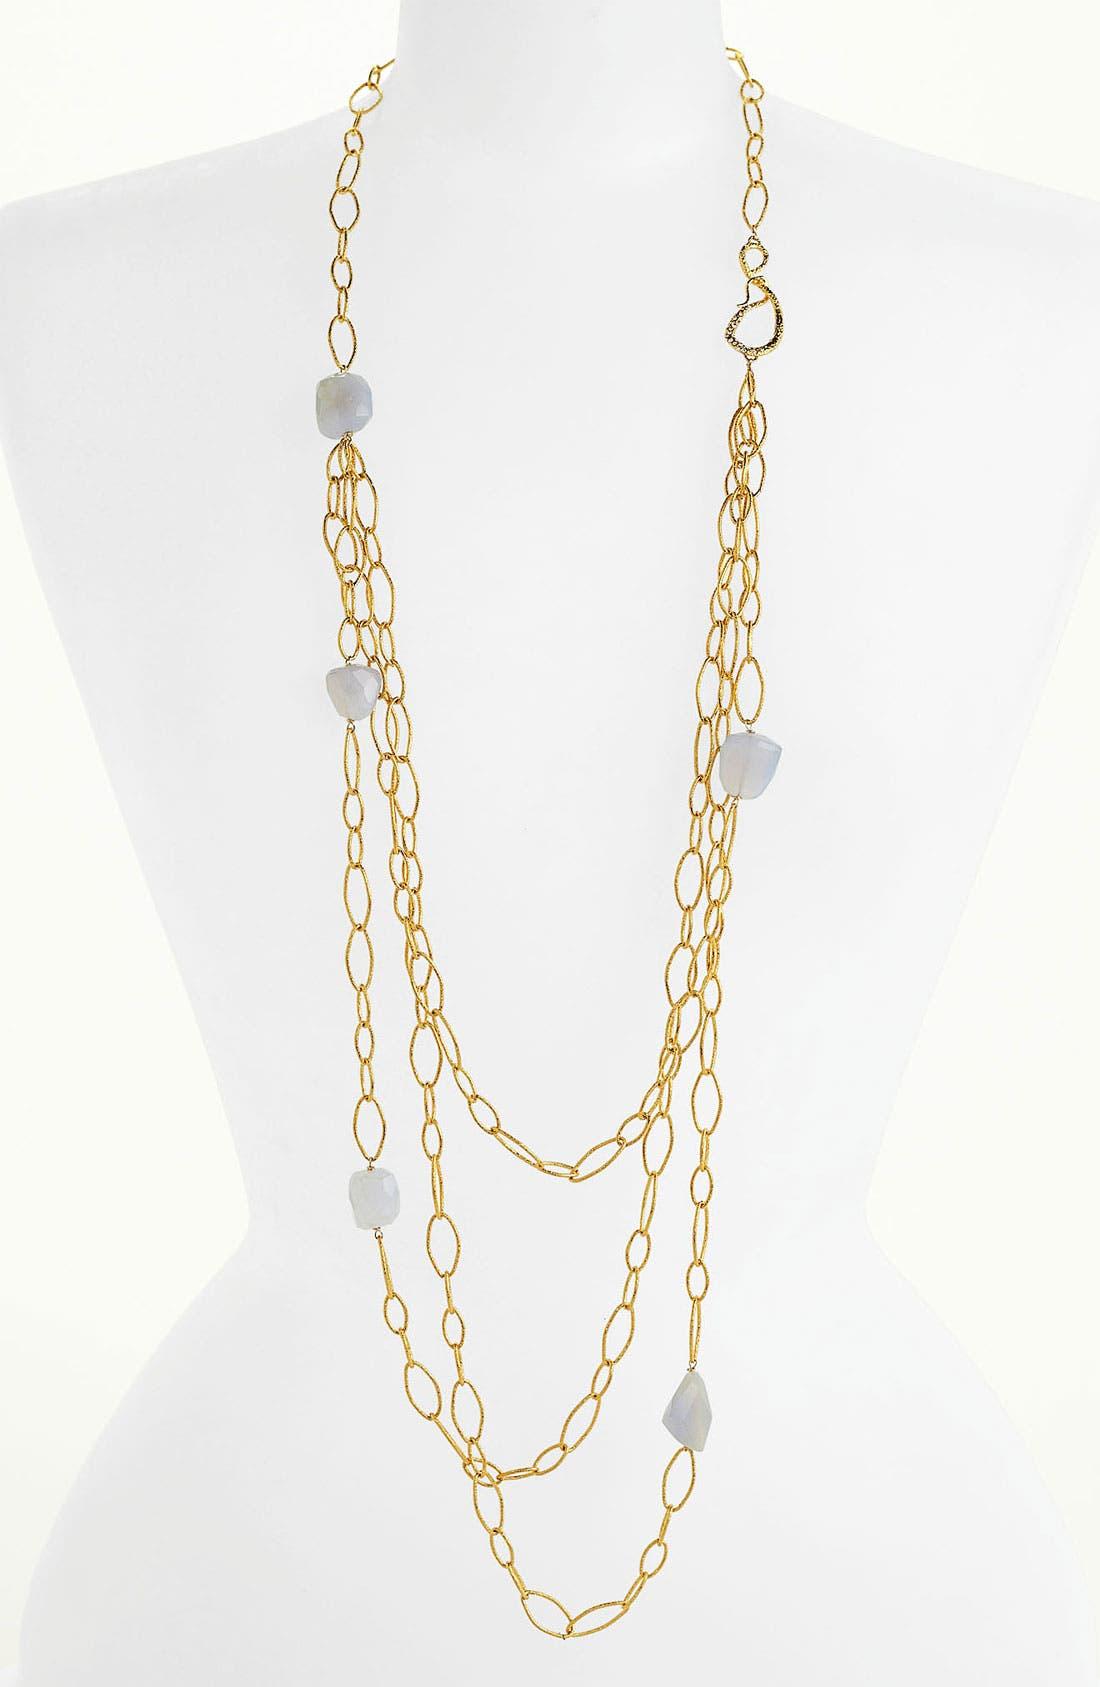 Alternate Image 1 Selected - Alexis Bittar 'Elements - Siyabona' Long Link Necklace